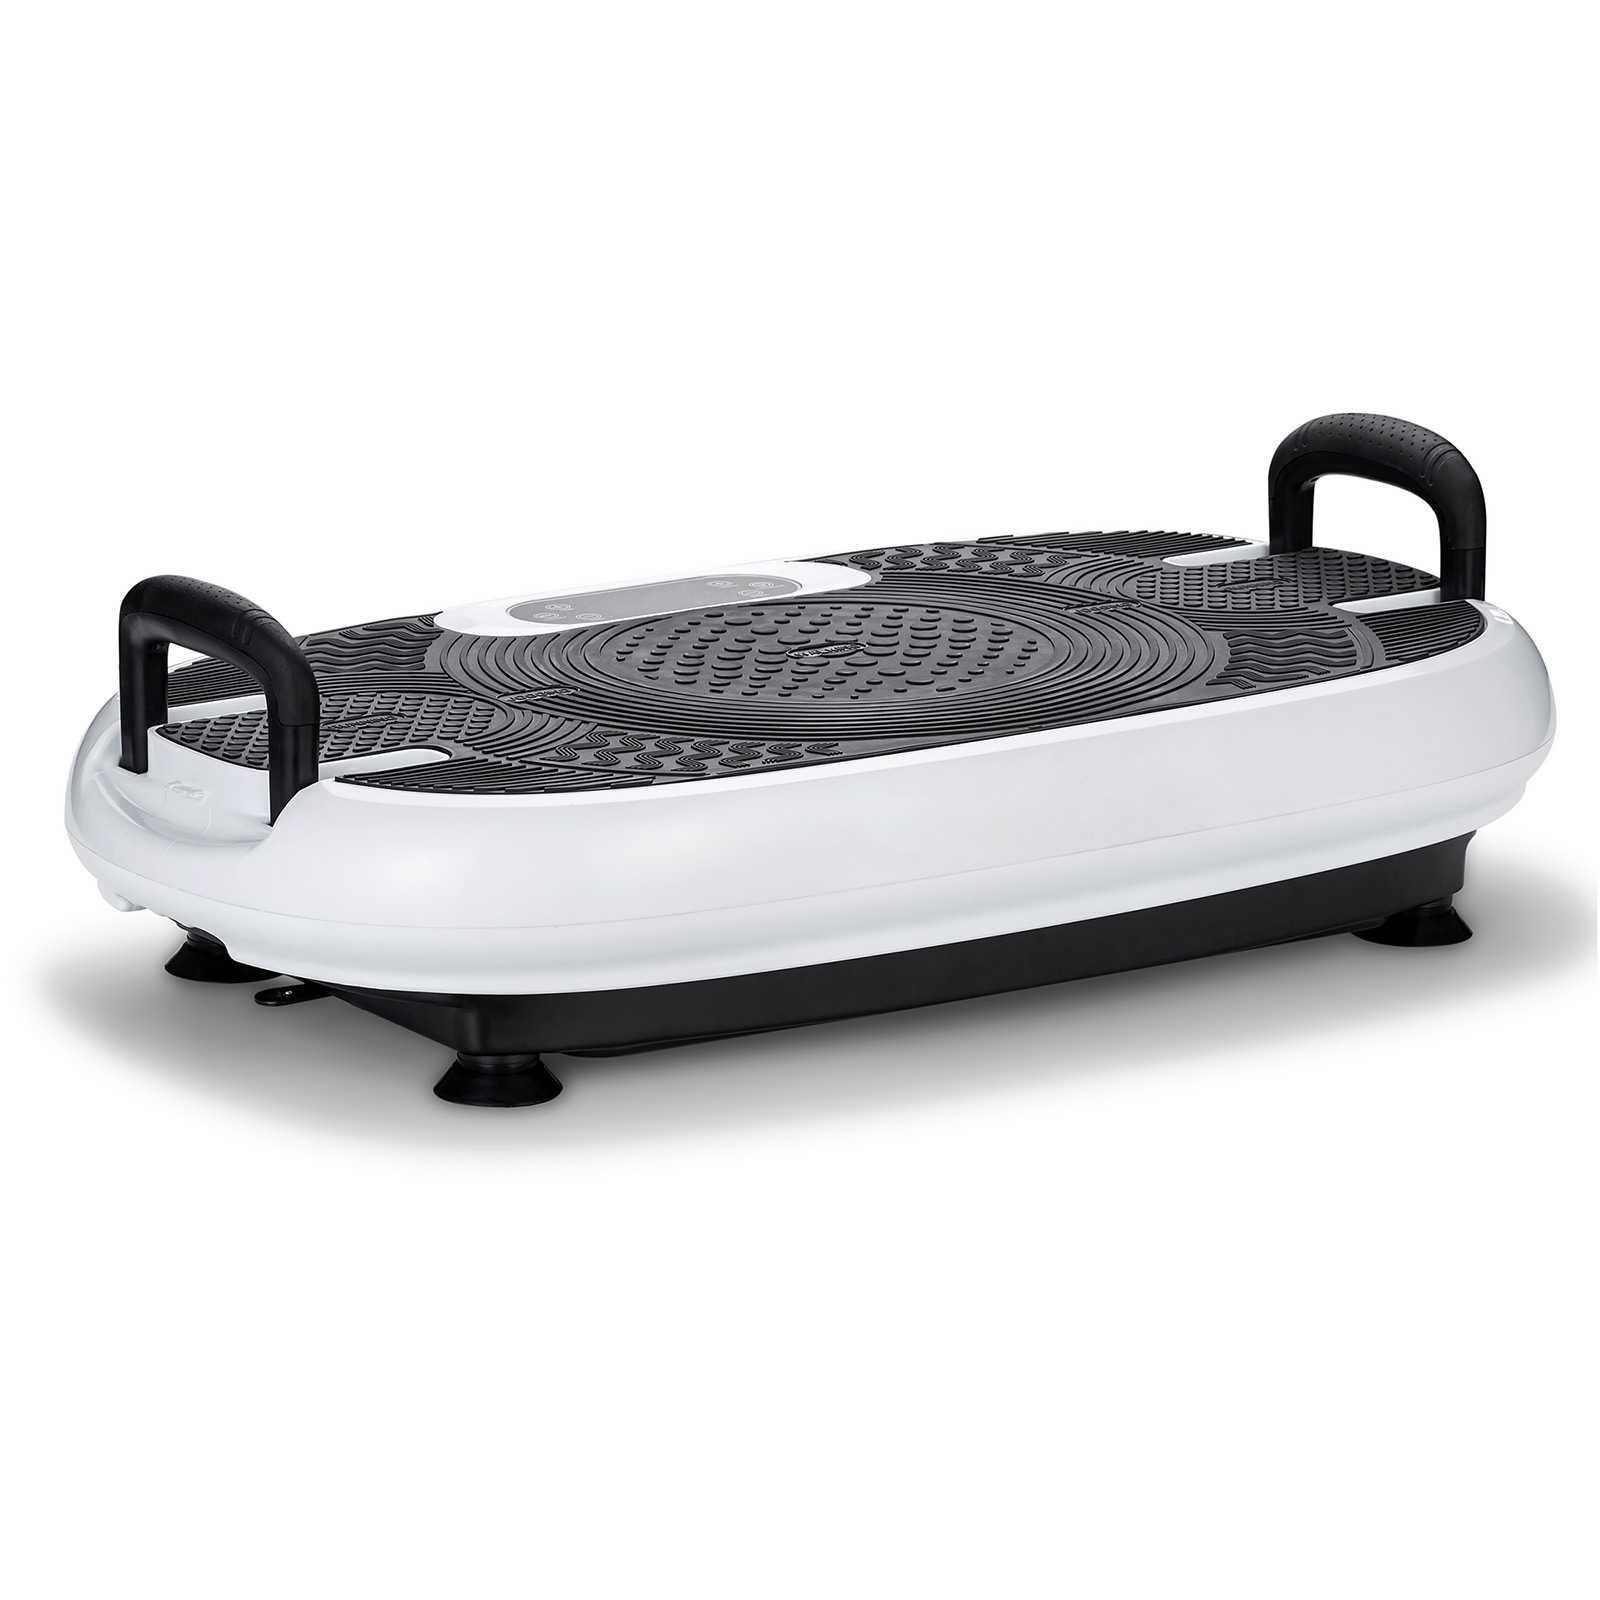 VibroSlim Radial Plus 3D Fitness Vibration Plate - White